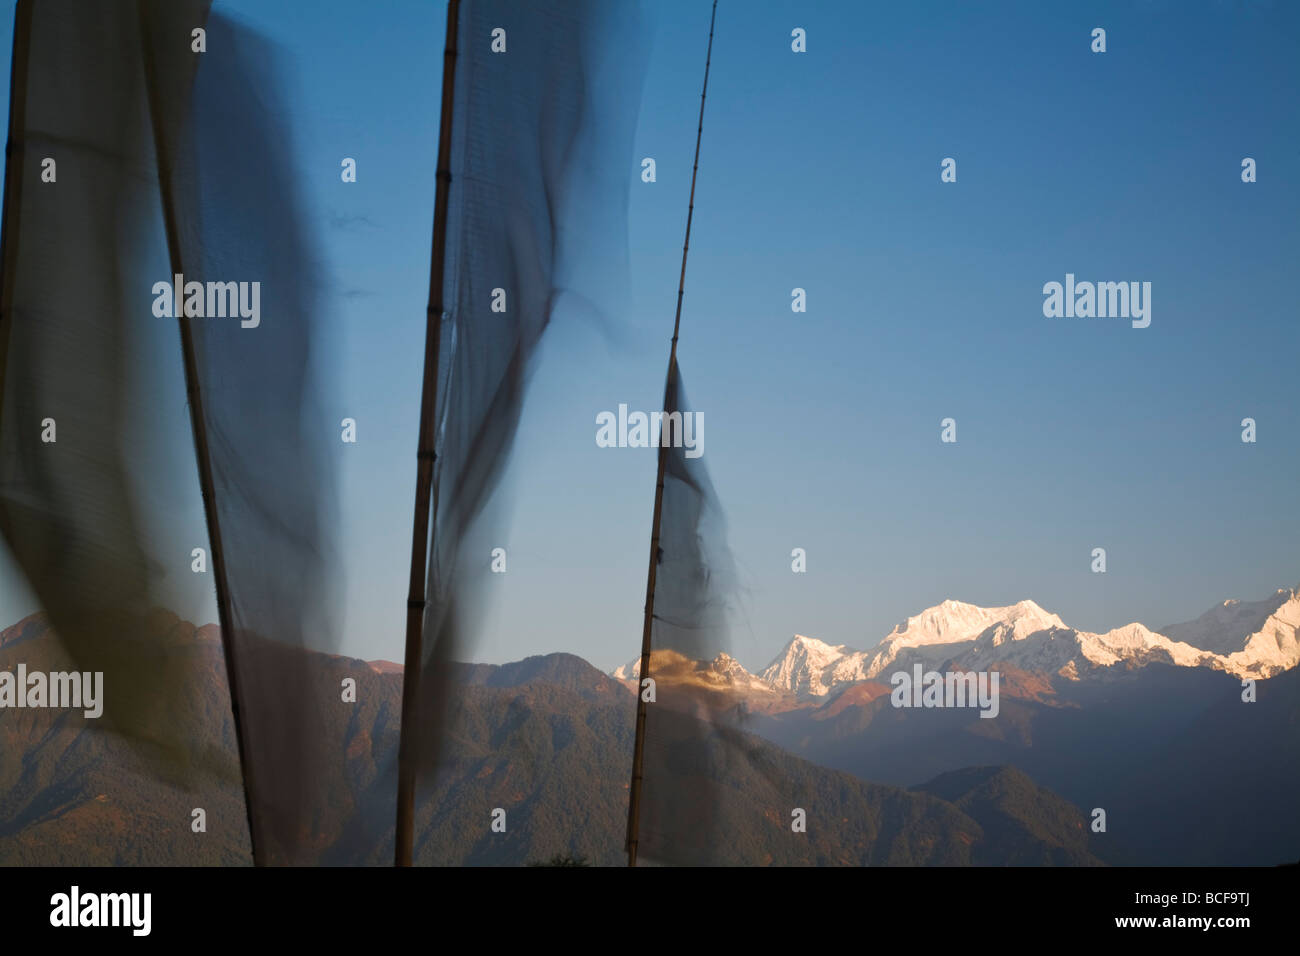 Indien, Sikkim, Pelling, obere Pelling, Gebetsfahnen und Kanchenjunga, Kangchendzönga-Sortiment Stockbild